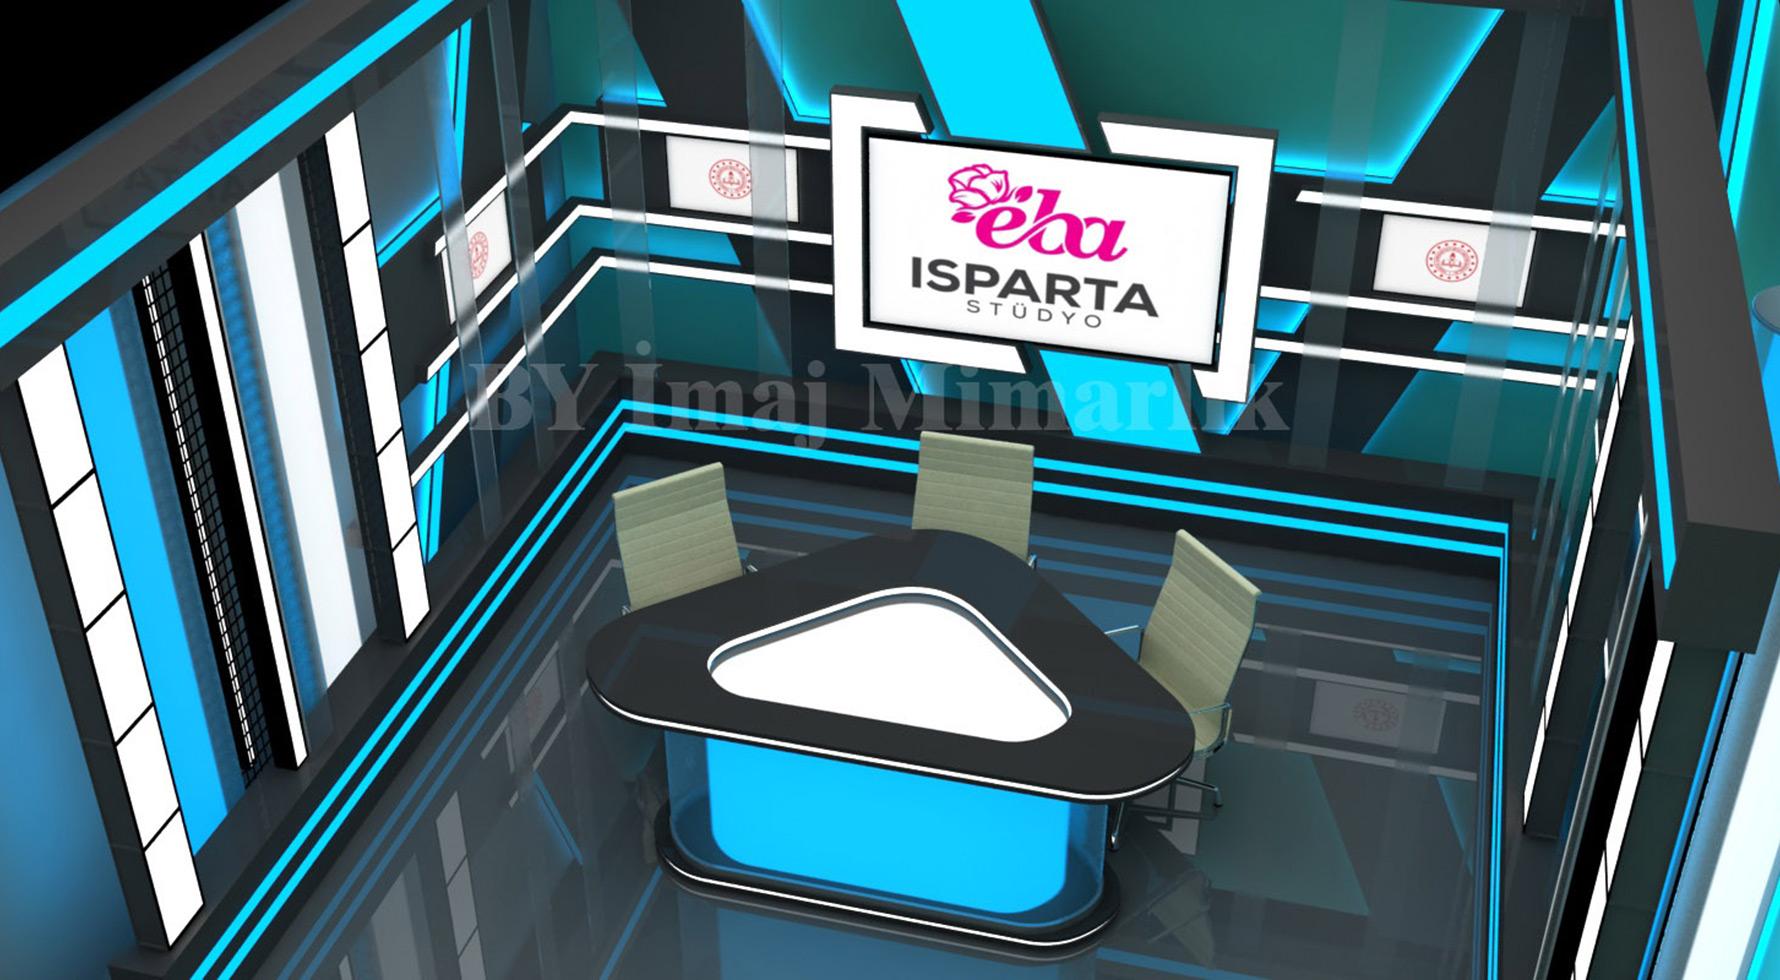 EBA ISPARTA